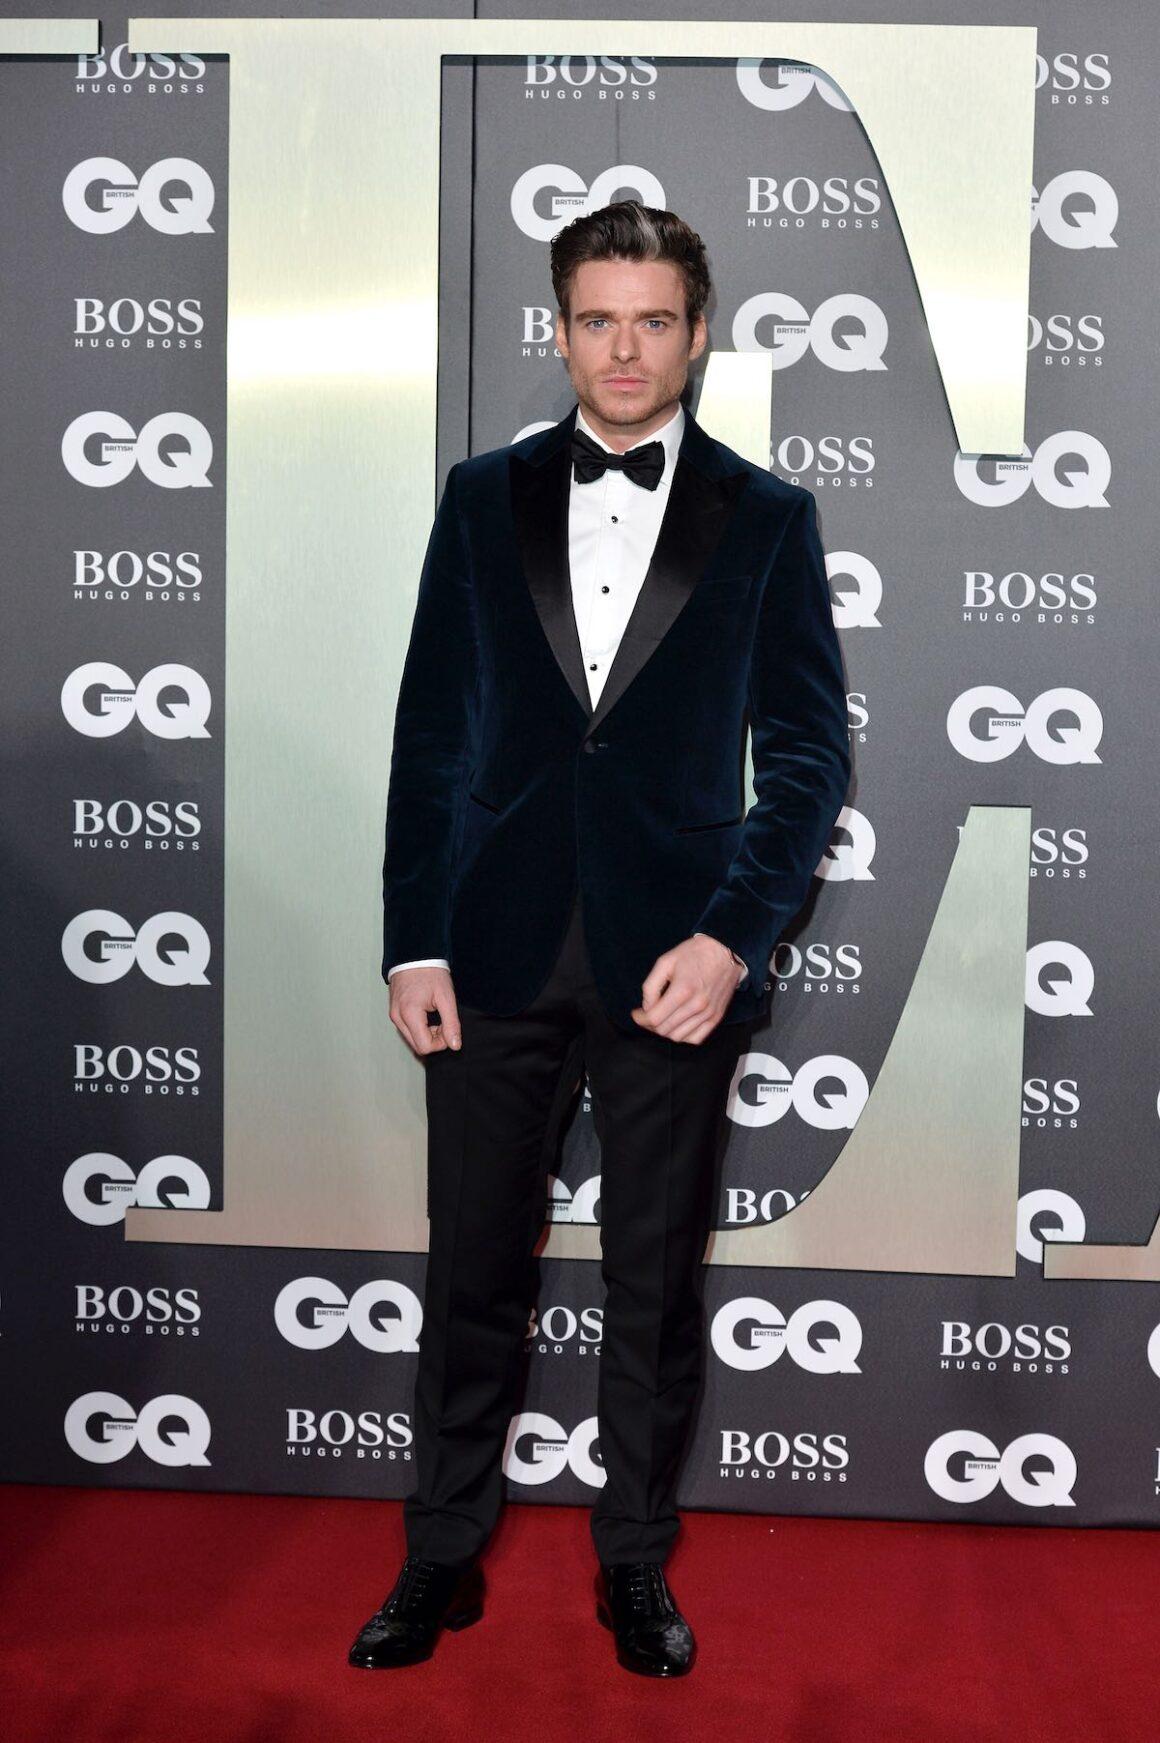 Richard Madden GQ Men Of The Year Awards 2019 - Red Carpet Arrivals